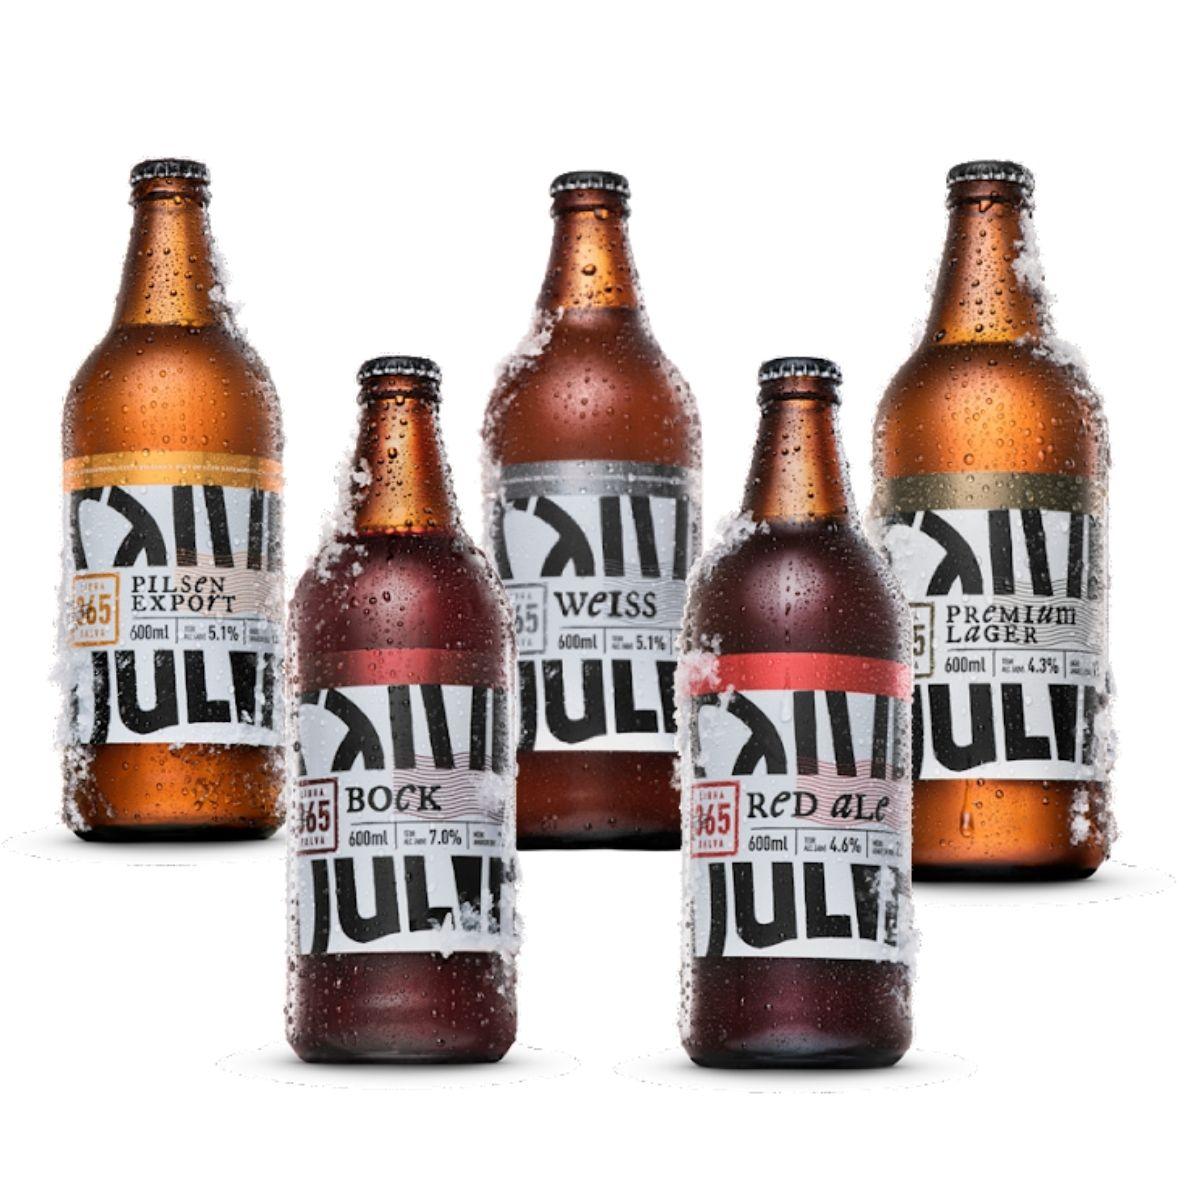 Kit degustação Salva 05 cervejas  - RS BEER - Cervejas Gaúchas